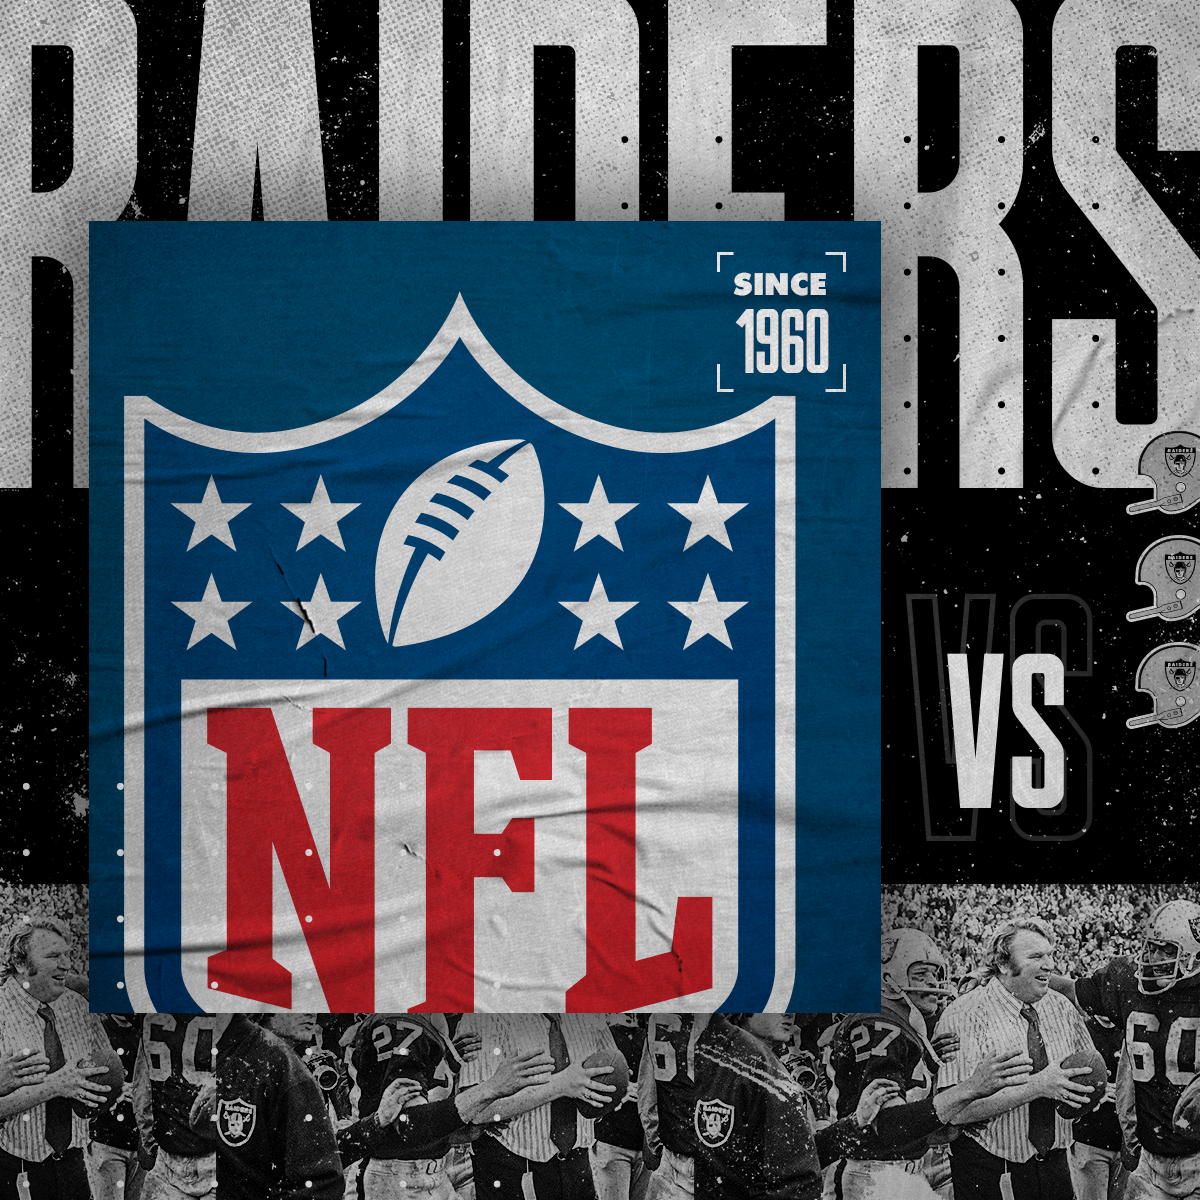 Raiders vs. NFL